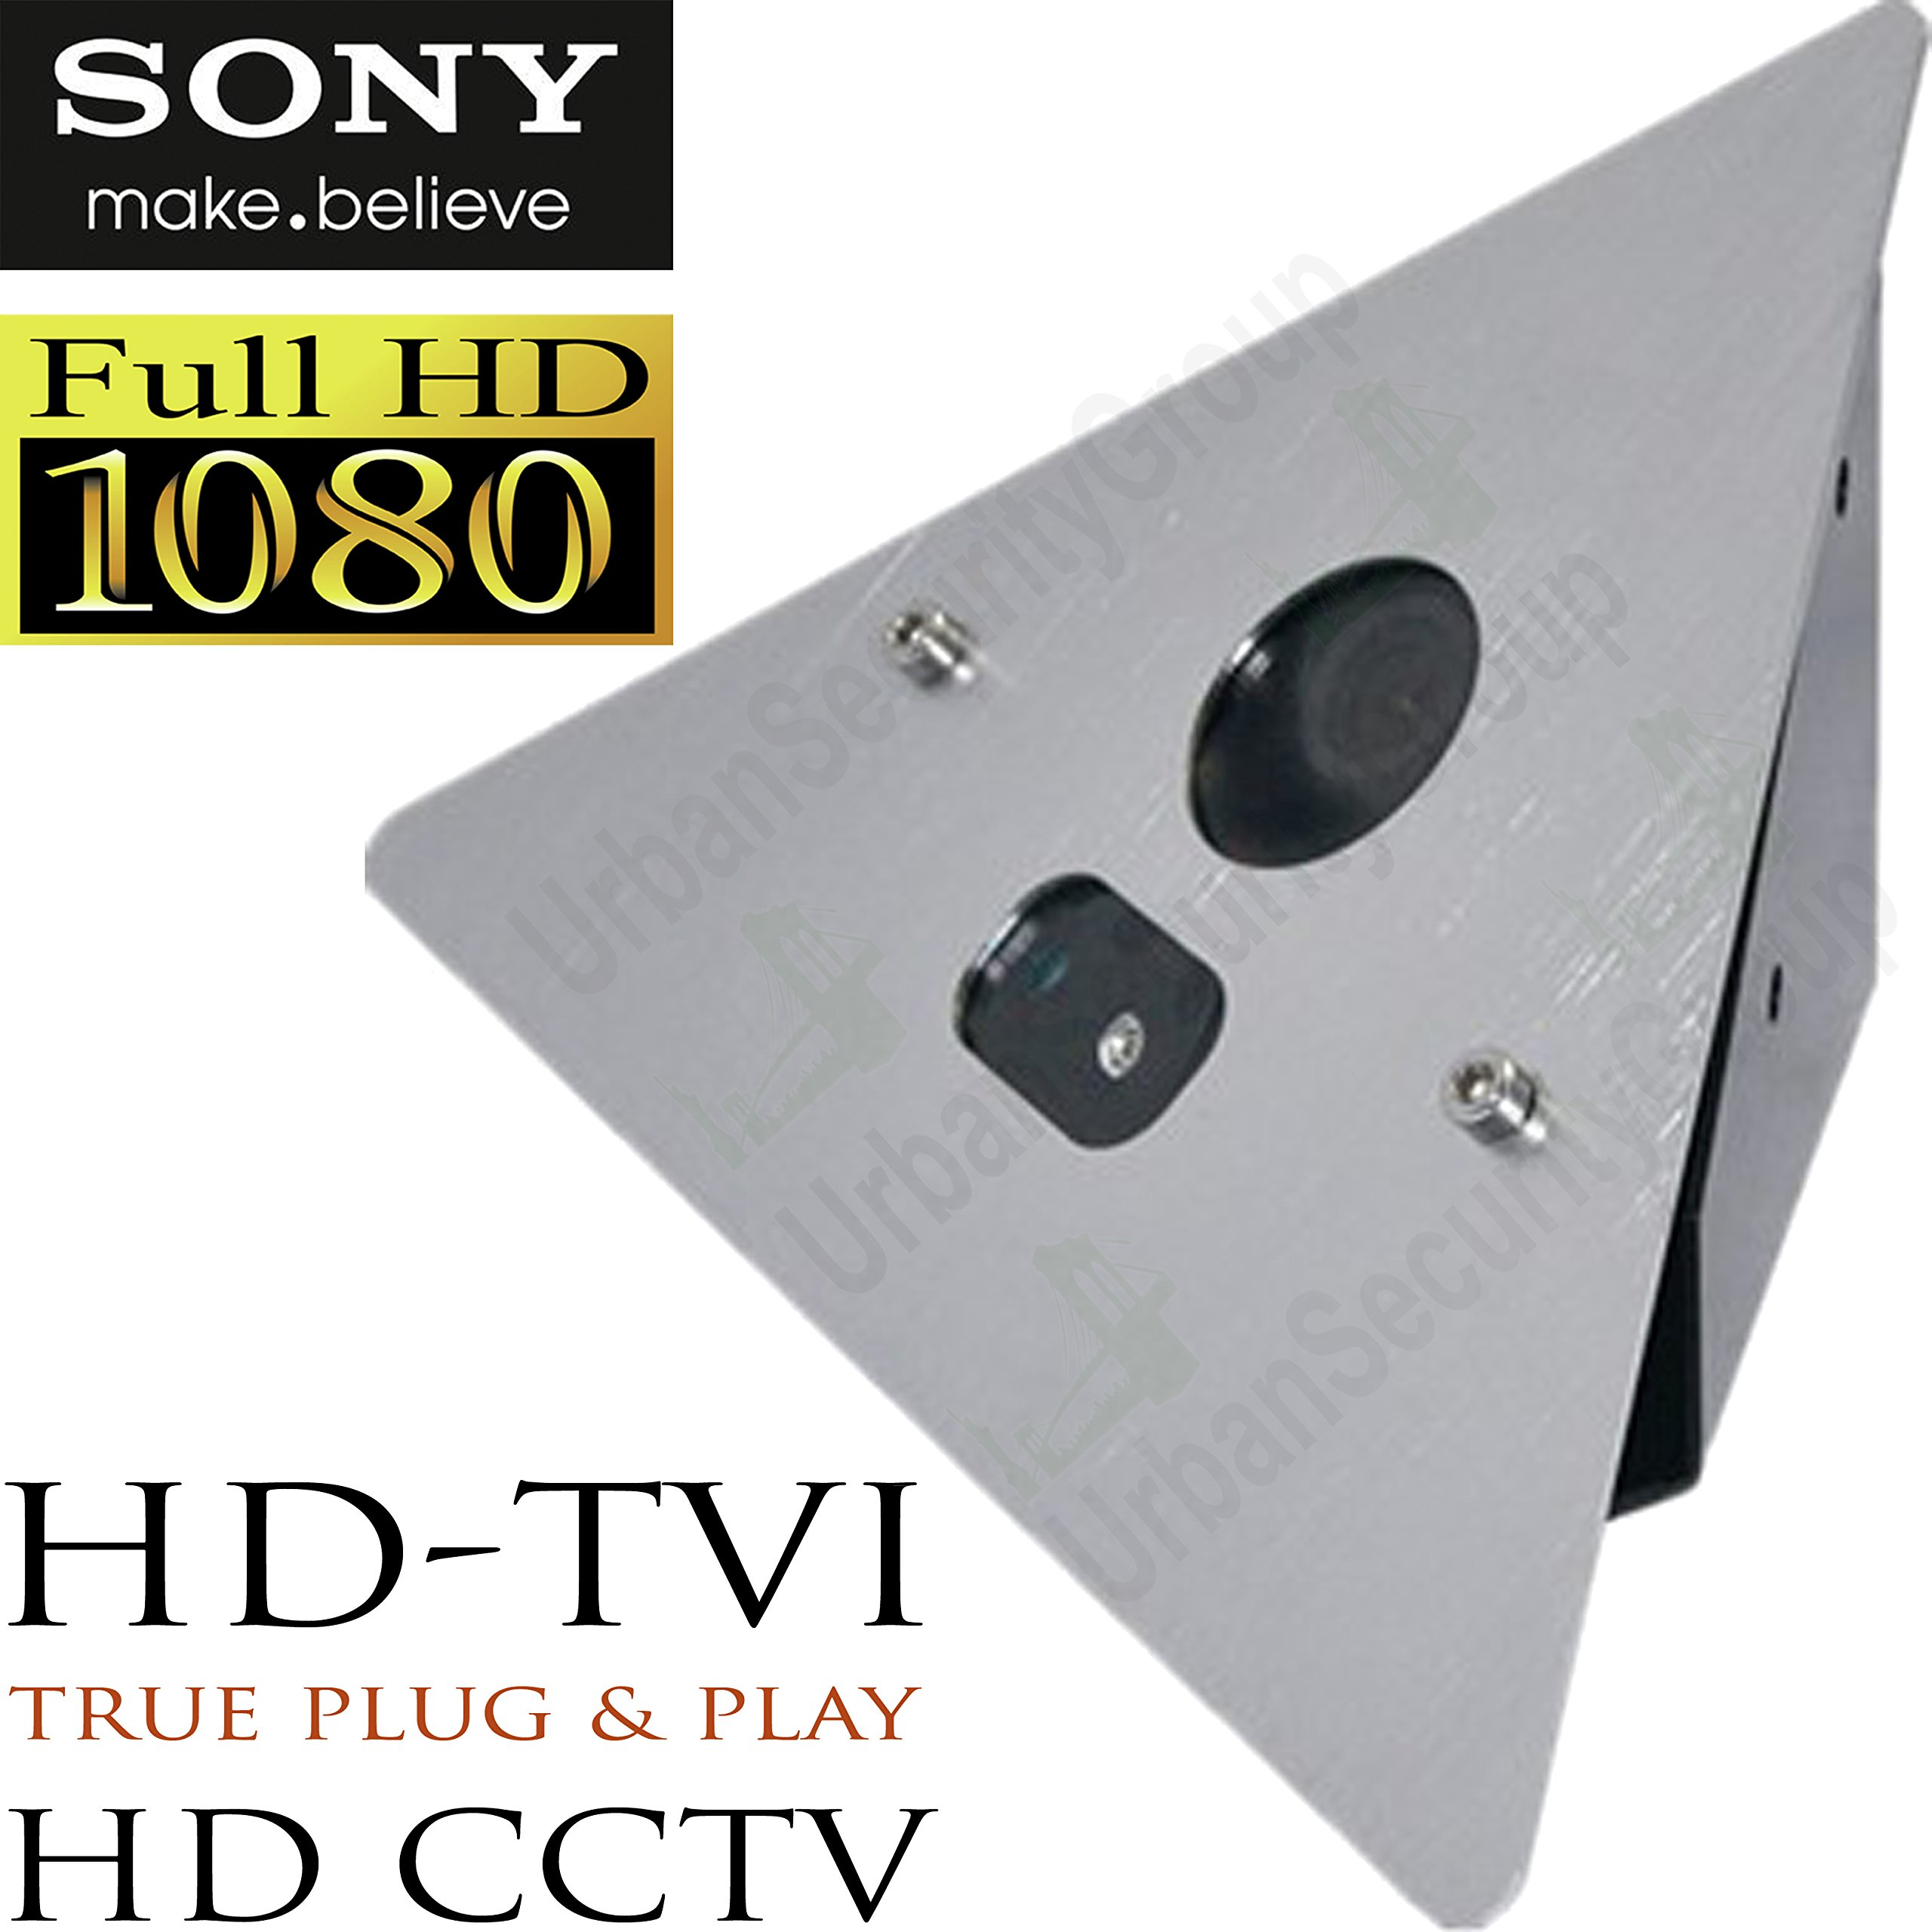 USG Corner Elevator Security Camera : HD-TVI 1080P @ 30FPS 2MP : Aluminum Metal Housing : 1x 42mil IR LED, 3.6mm Wide Angle Lens, Sony IMX323 DSP, WDR, Zoom : Business Grade